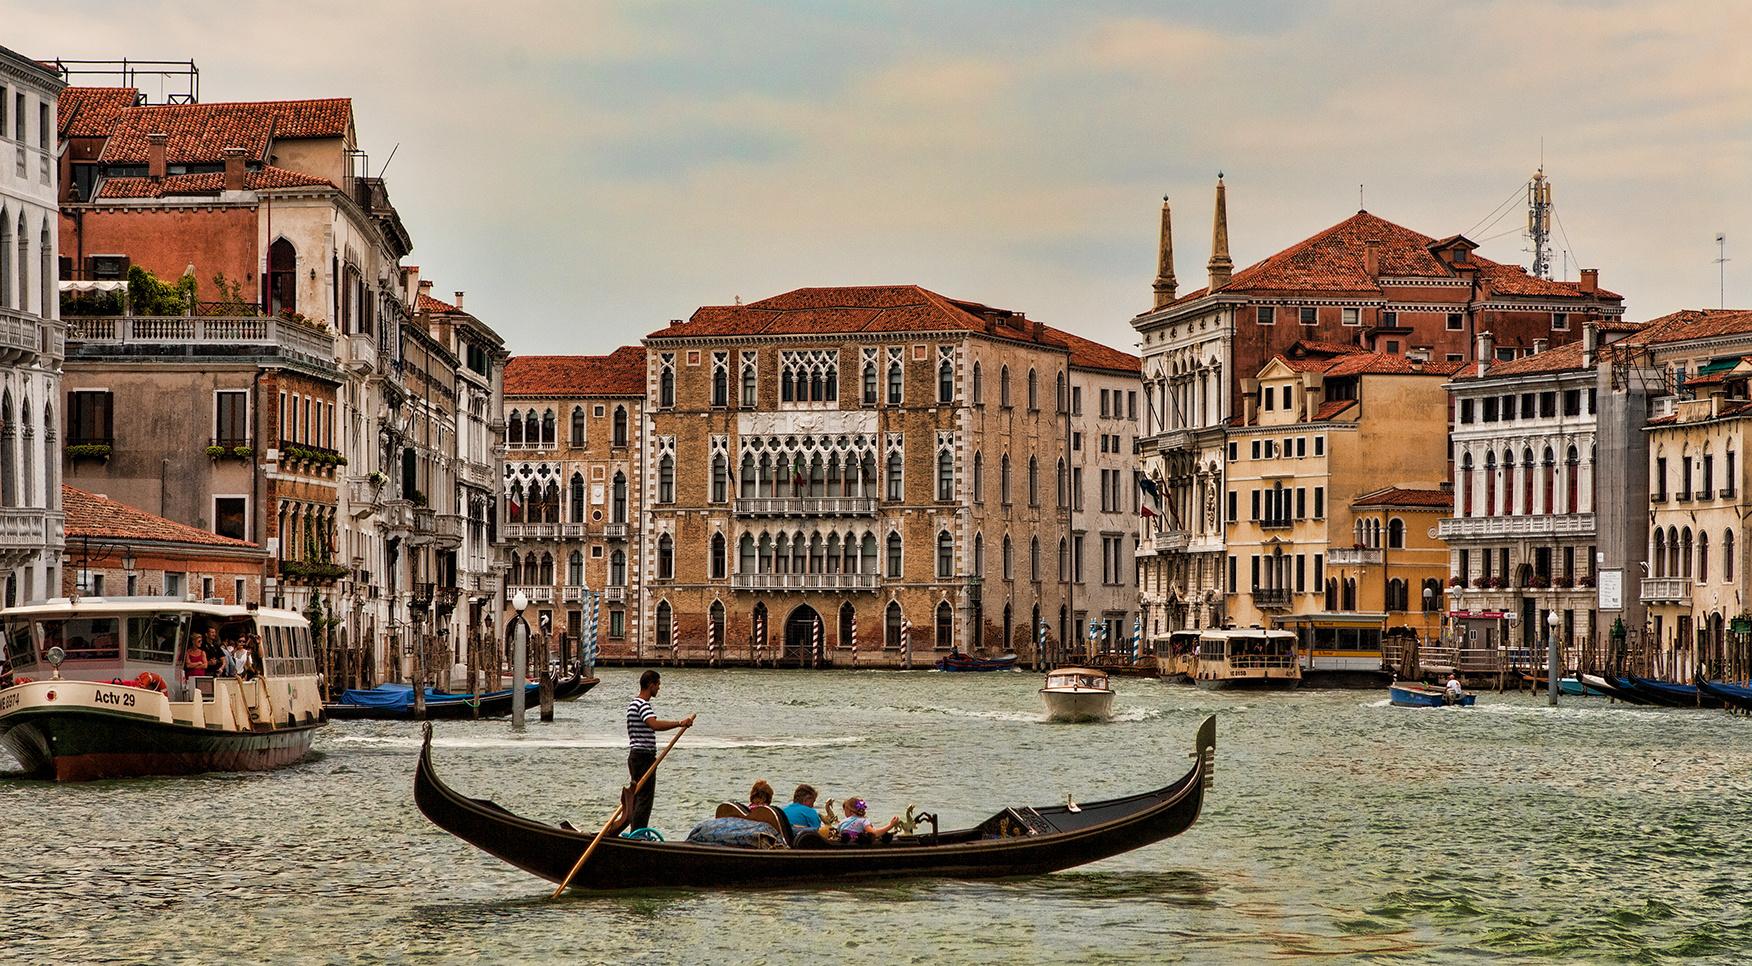 klassisch - Gondel auf dem Canal Grande